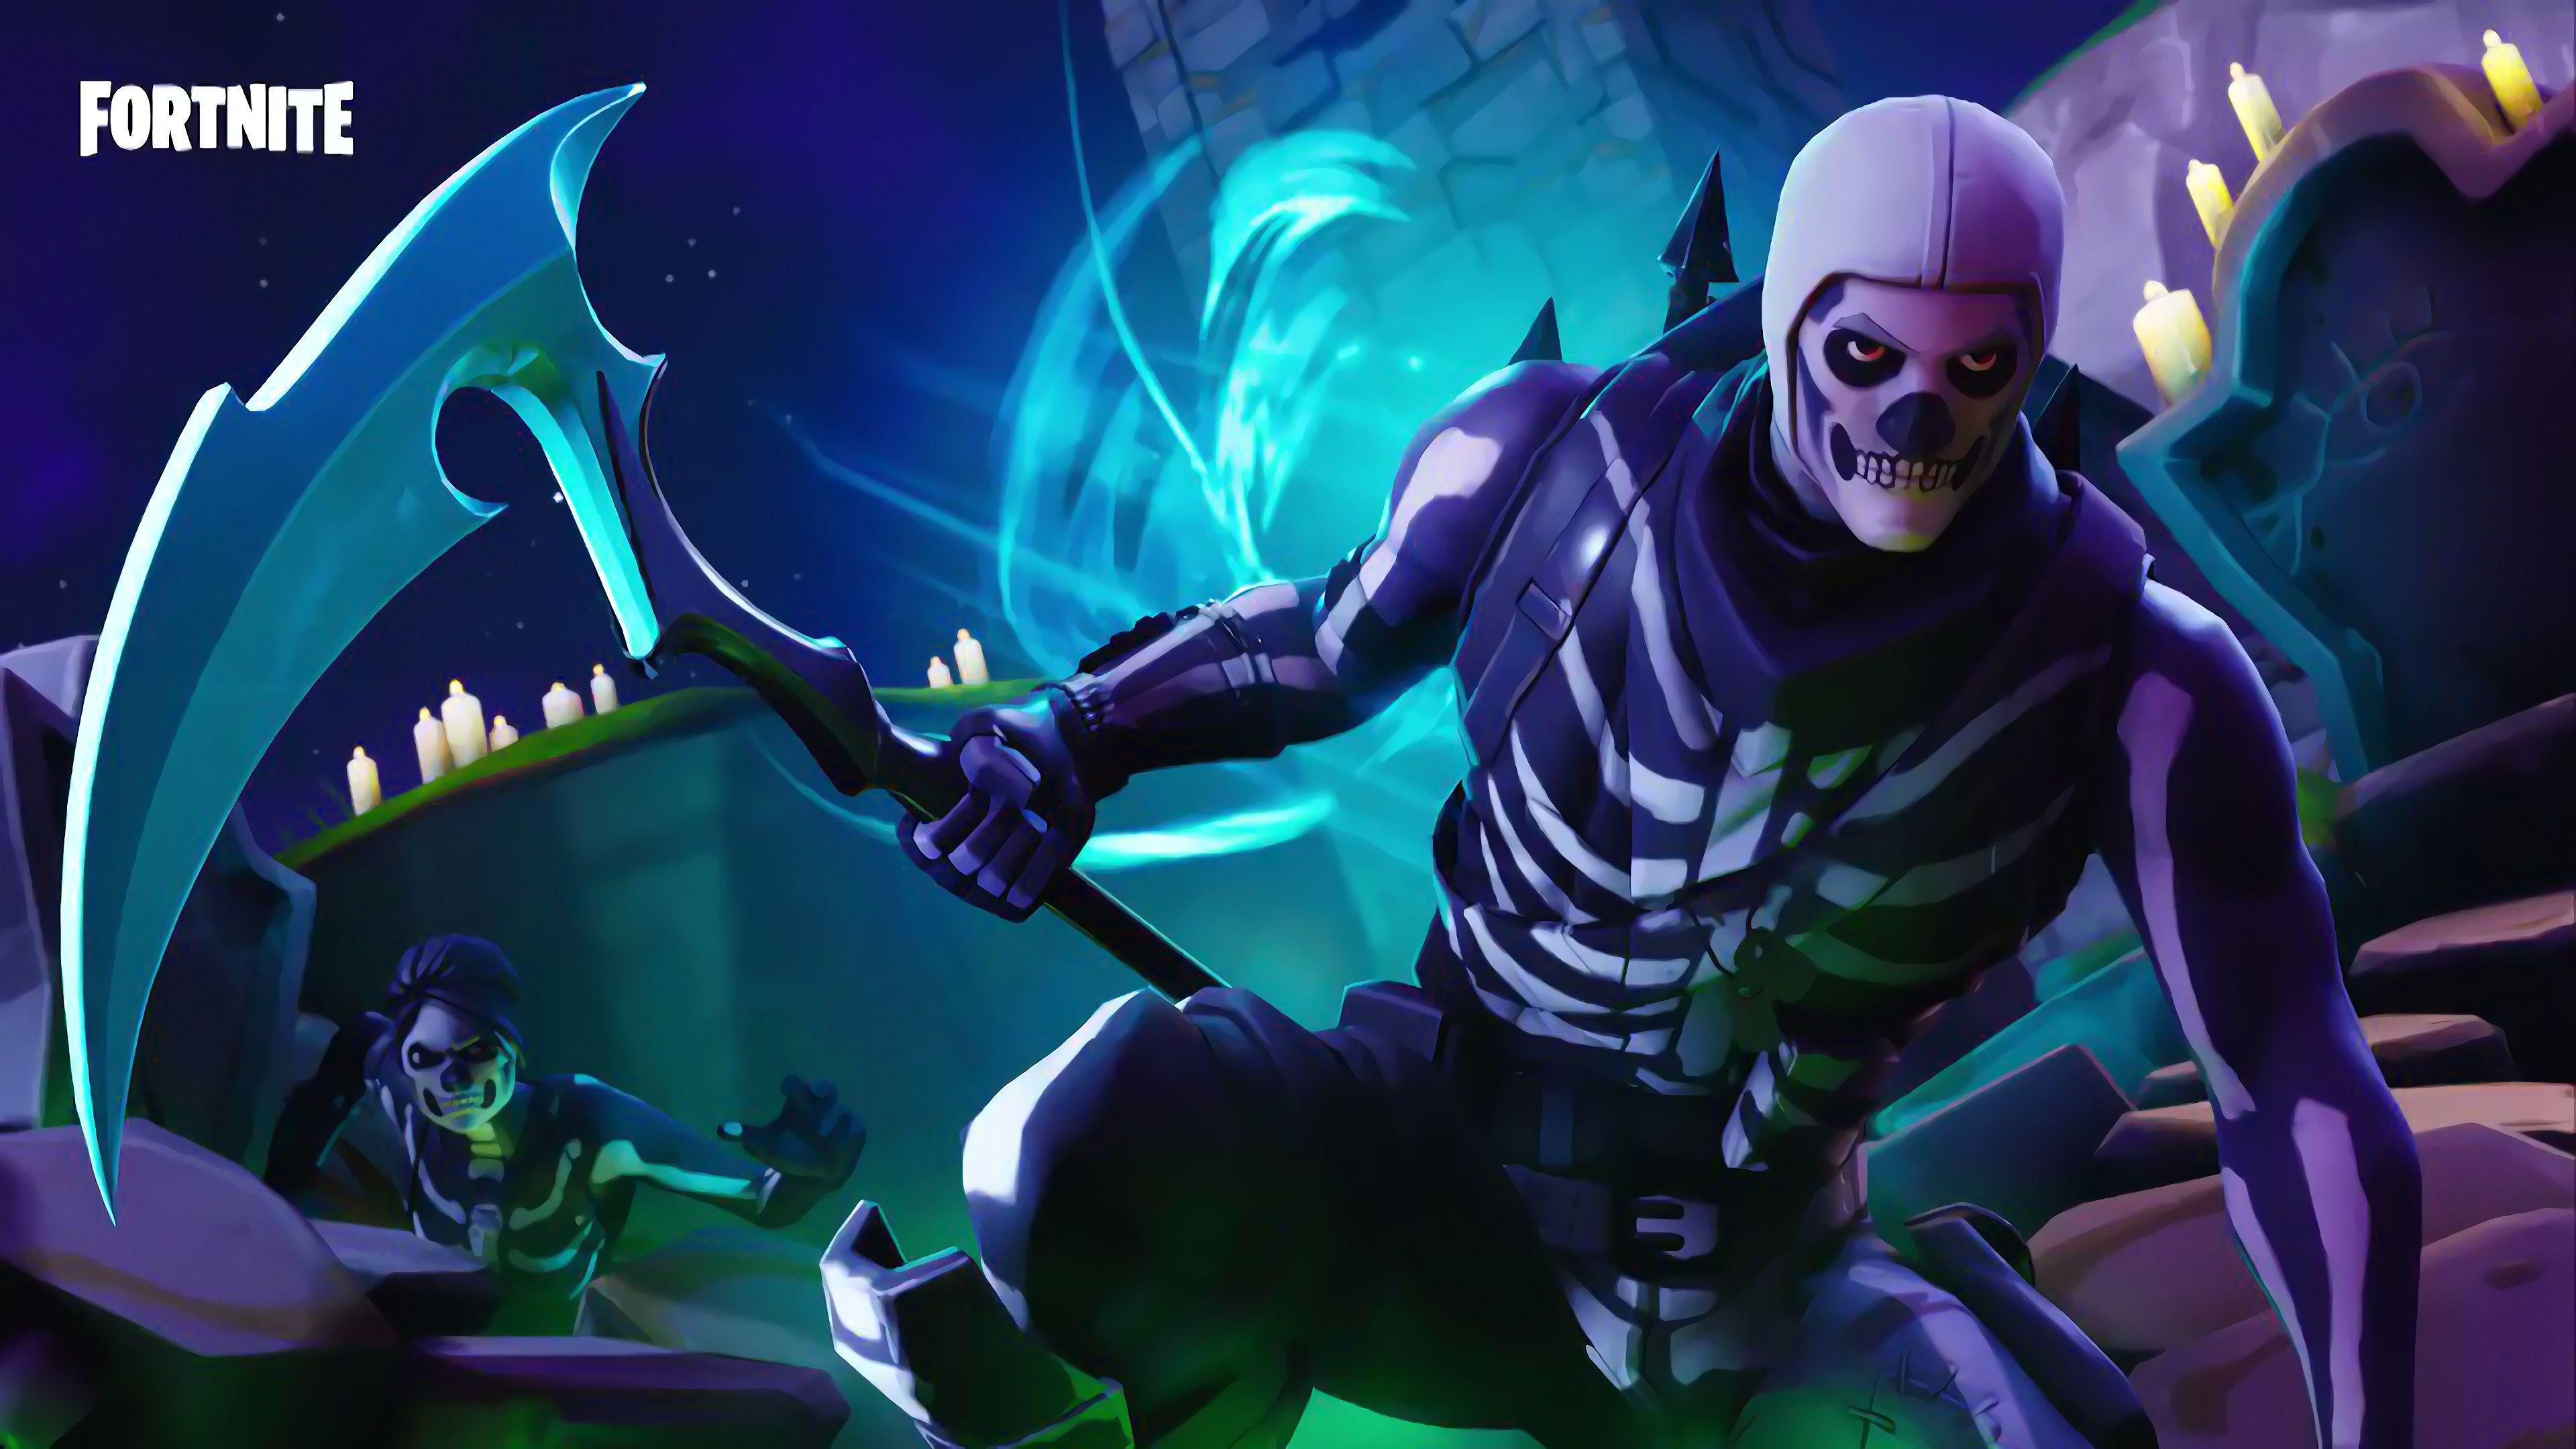 Fortnite Halloween Wallpapers Top Free Fortnite Halloween Backgrounds Wallpaperaccess